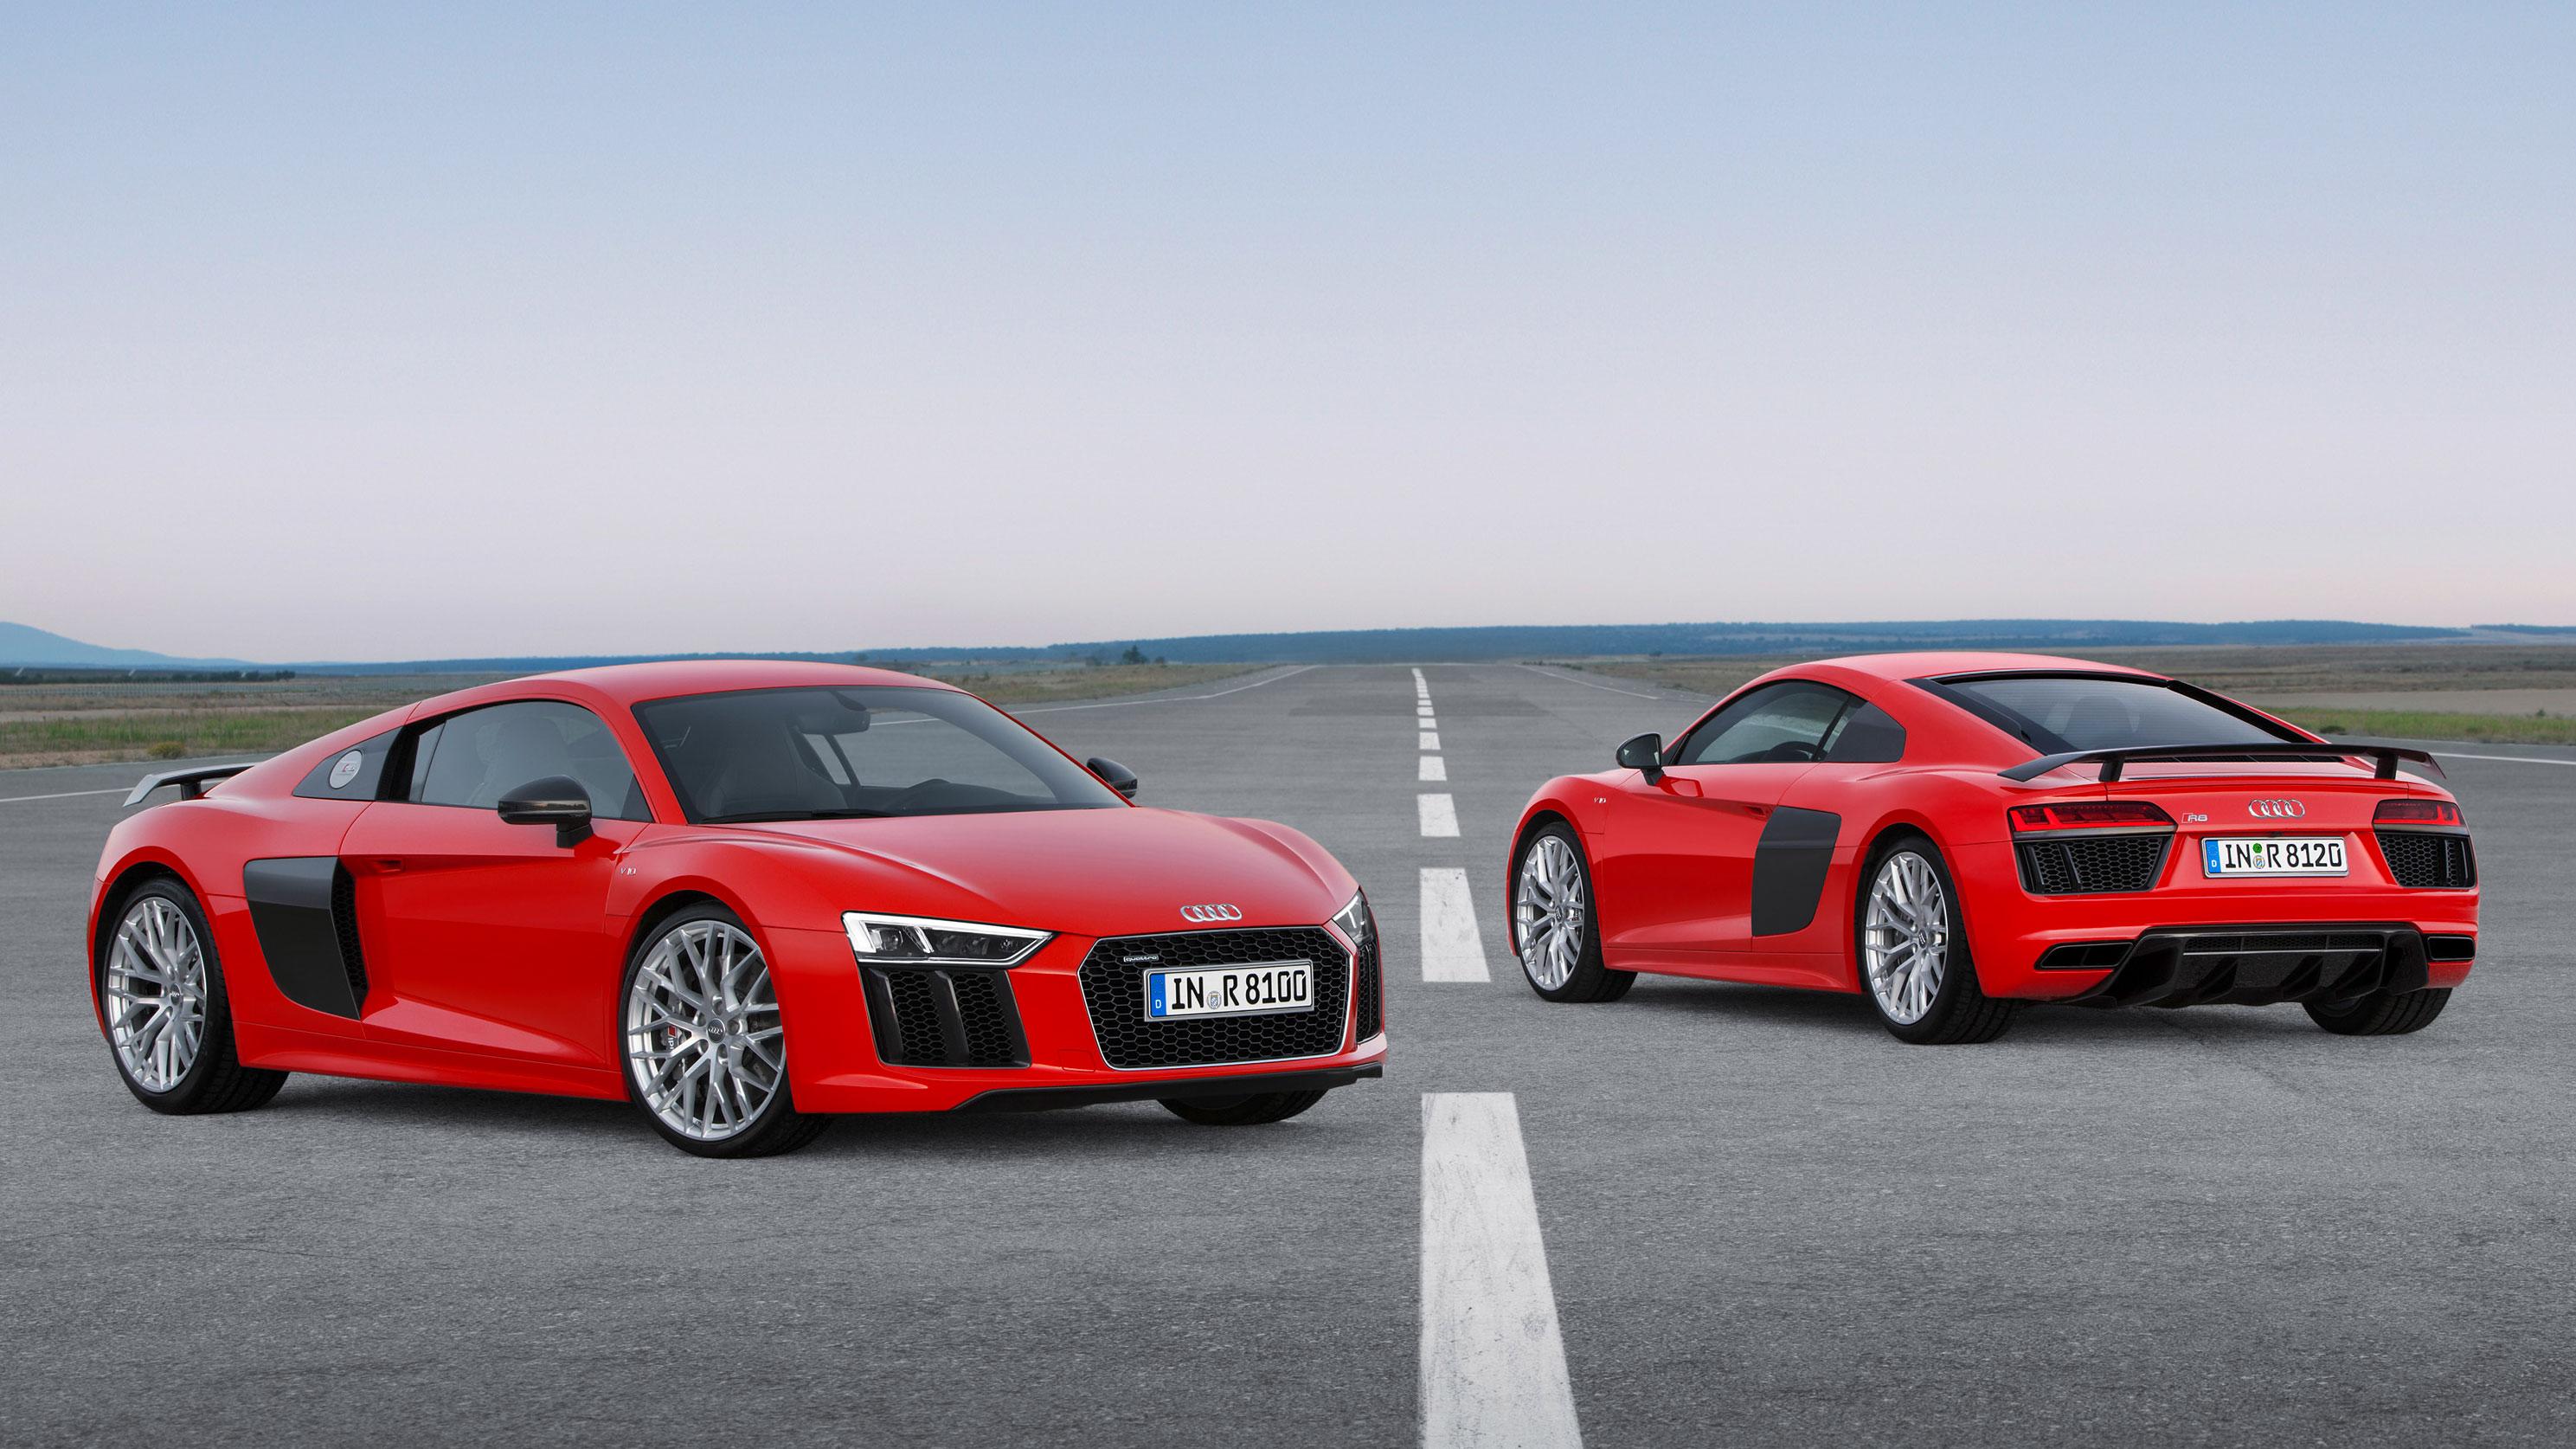 2015 Audi R8 R8 Coupe Ab Dem 13 Mai 2015 Bestellbar Auto Geil